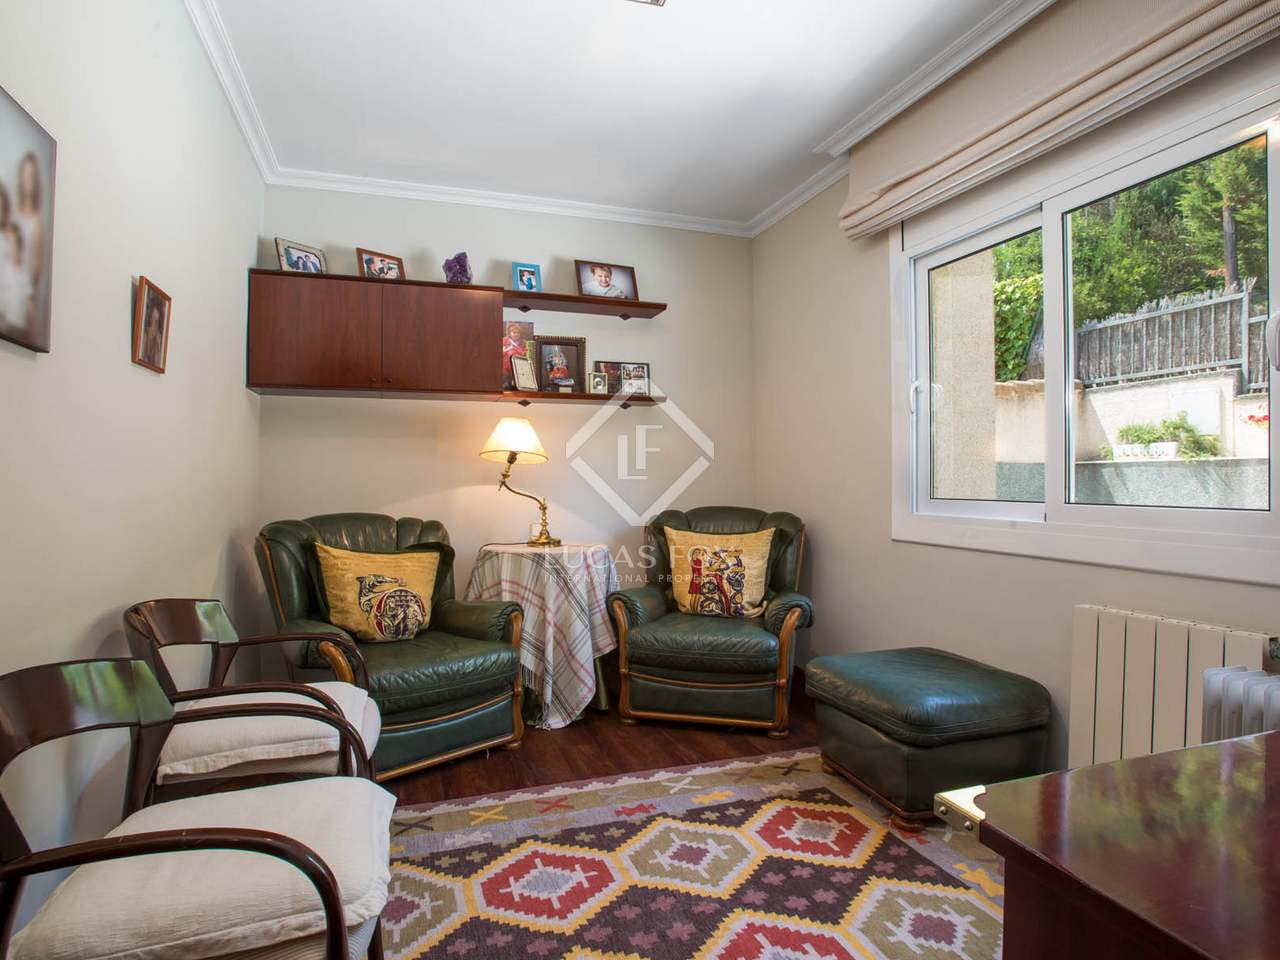 5 bedroom detached house for sale in argentona for 5 bedroom house for sale